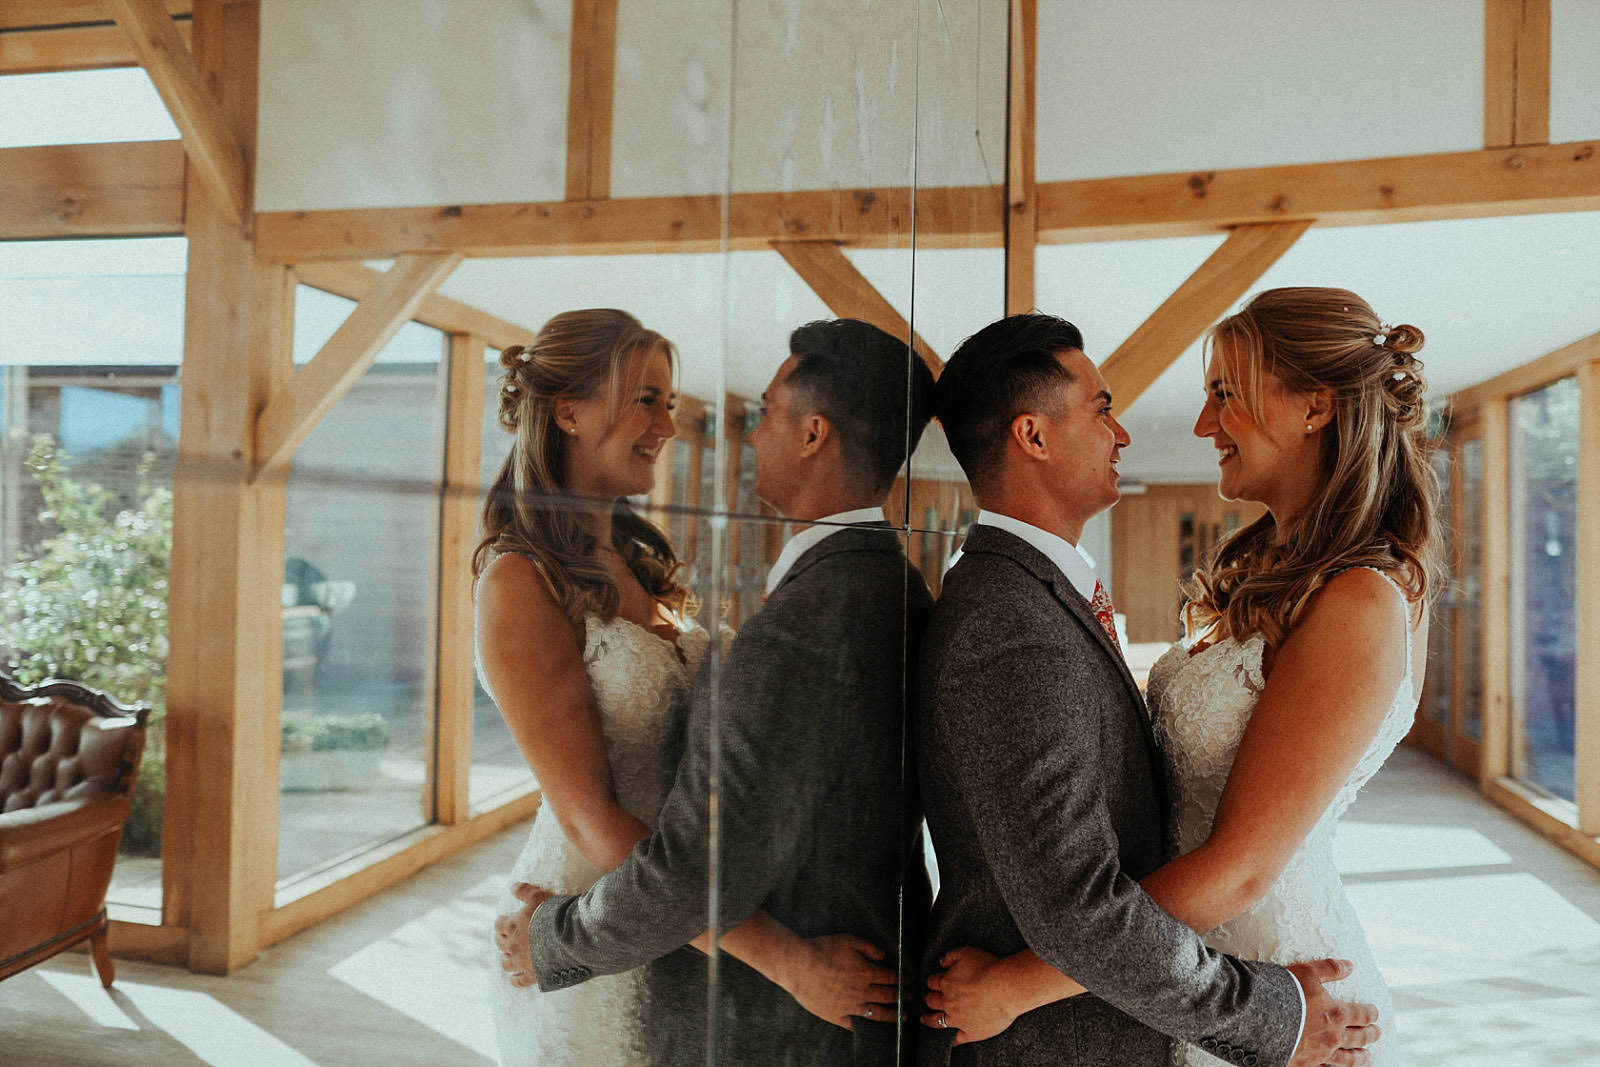 Wedding photographer at Pryor Hayes wedding venue